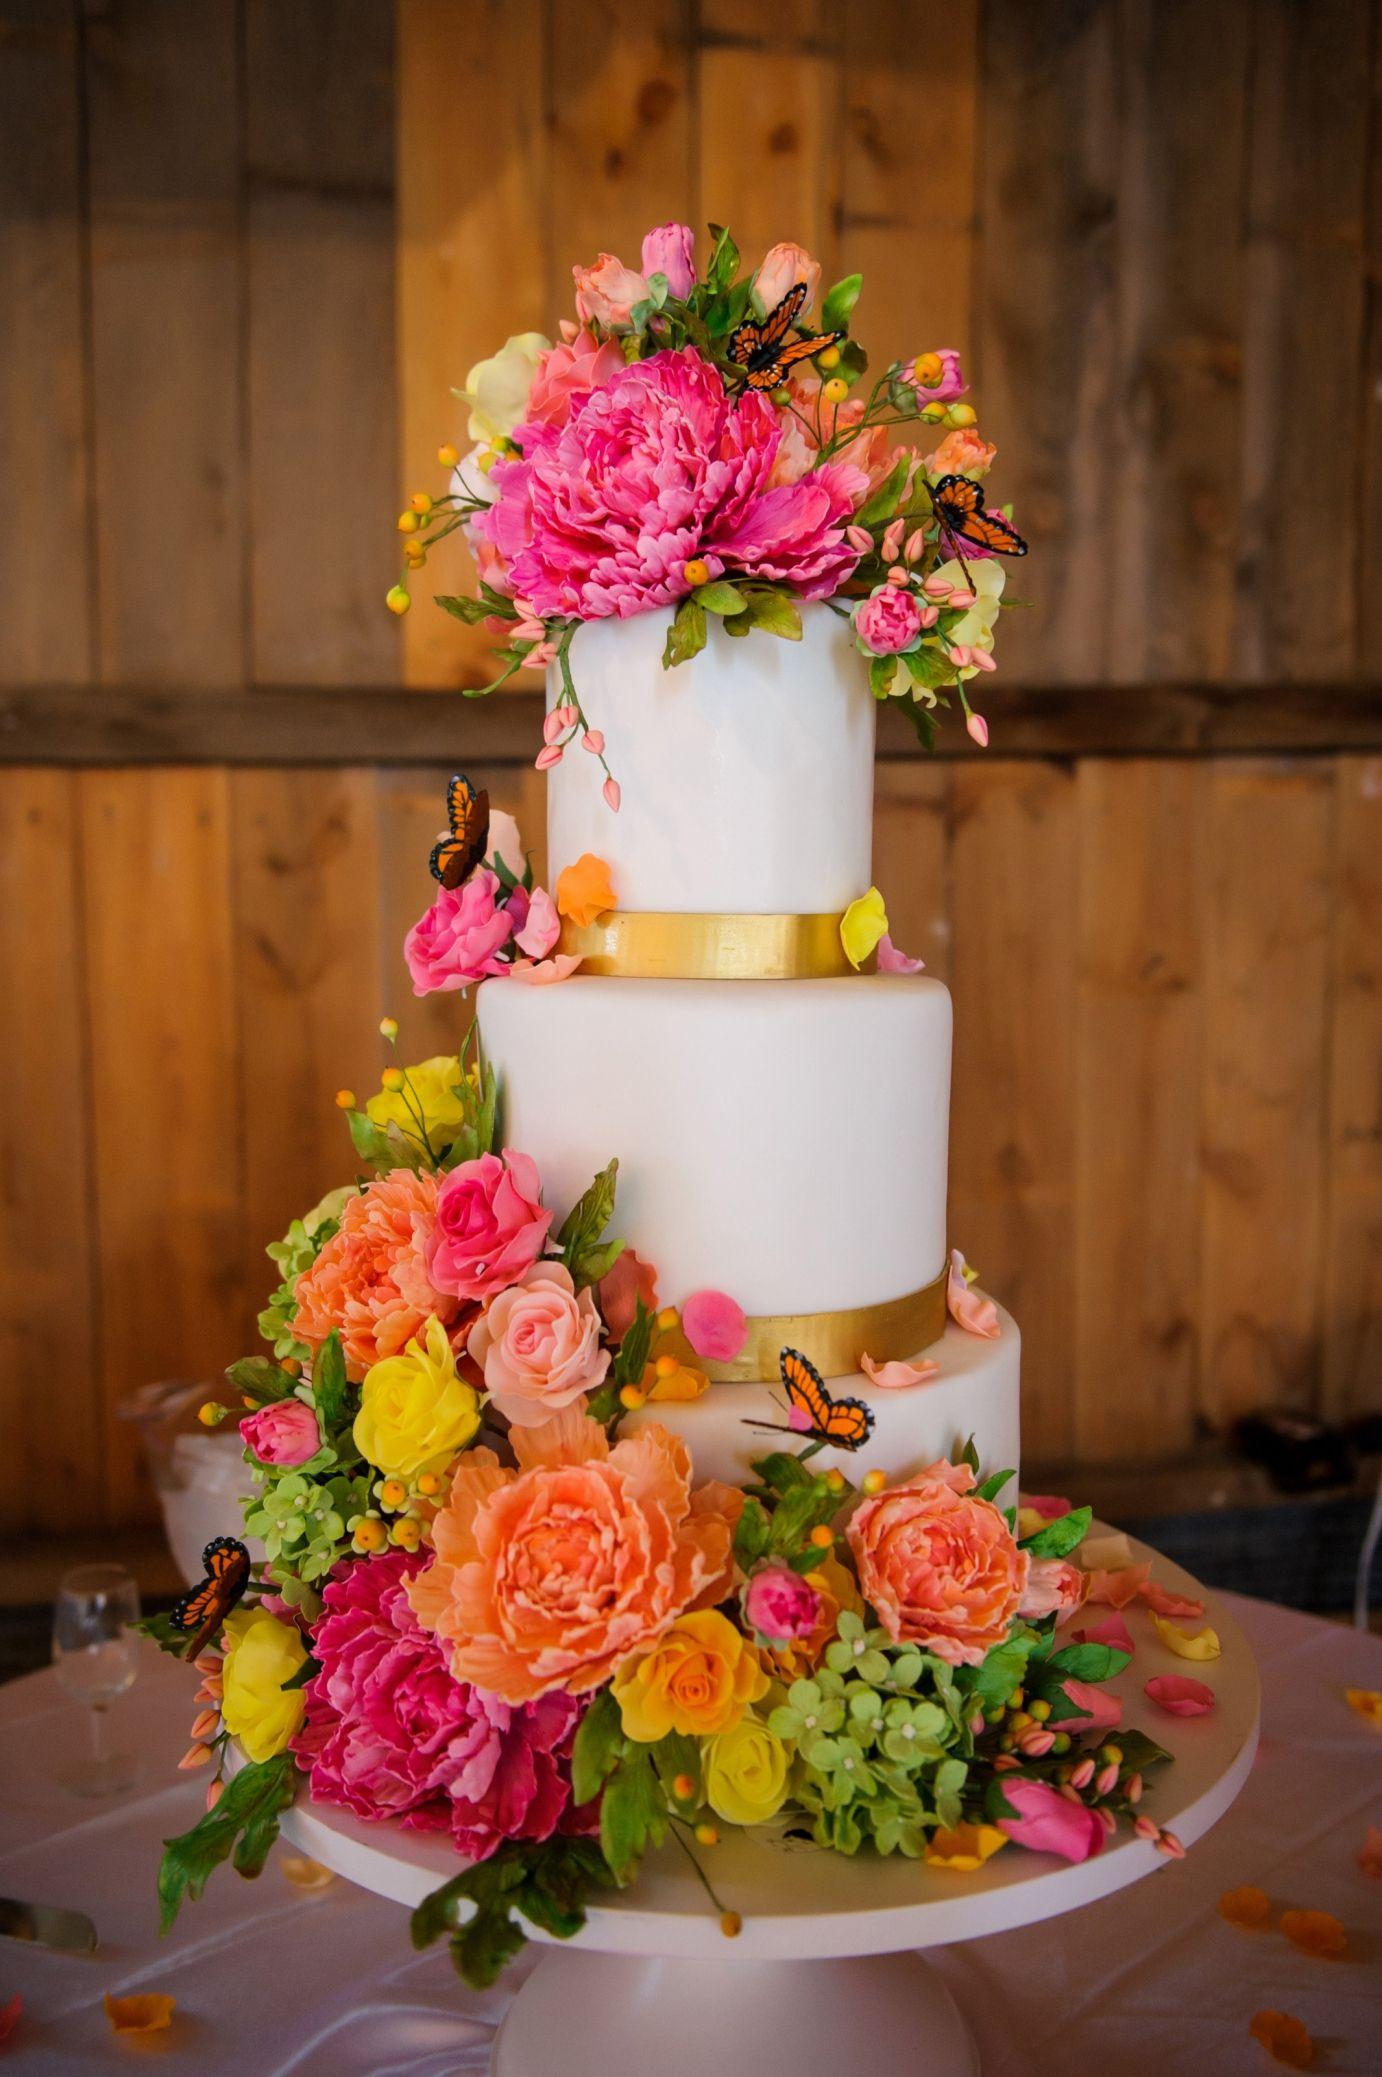 Mischief Maker Cakes I Bright Sugar Flower Wedding Cake #mischiefmakercakes #themischiefmaker #happyweddingcake #sugarflowerweddingcake #sugarflowers #indianwedding #indianweddingcake #brightcolors #bemischievious